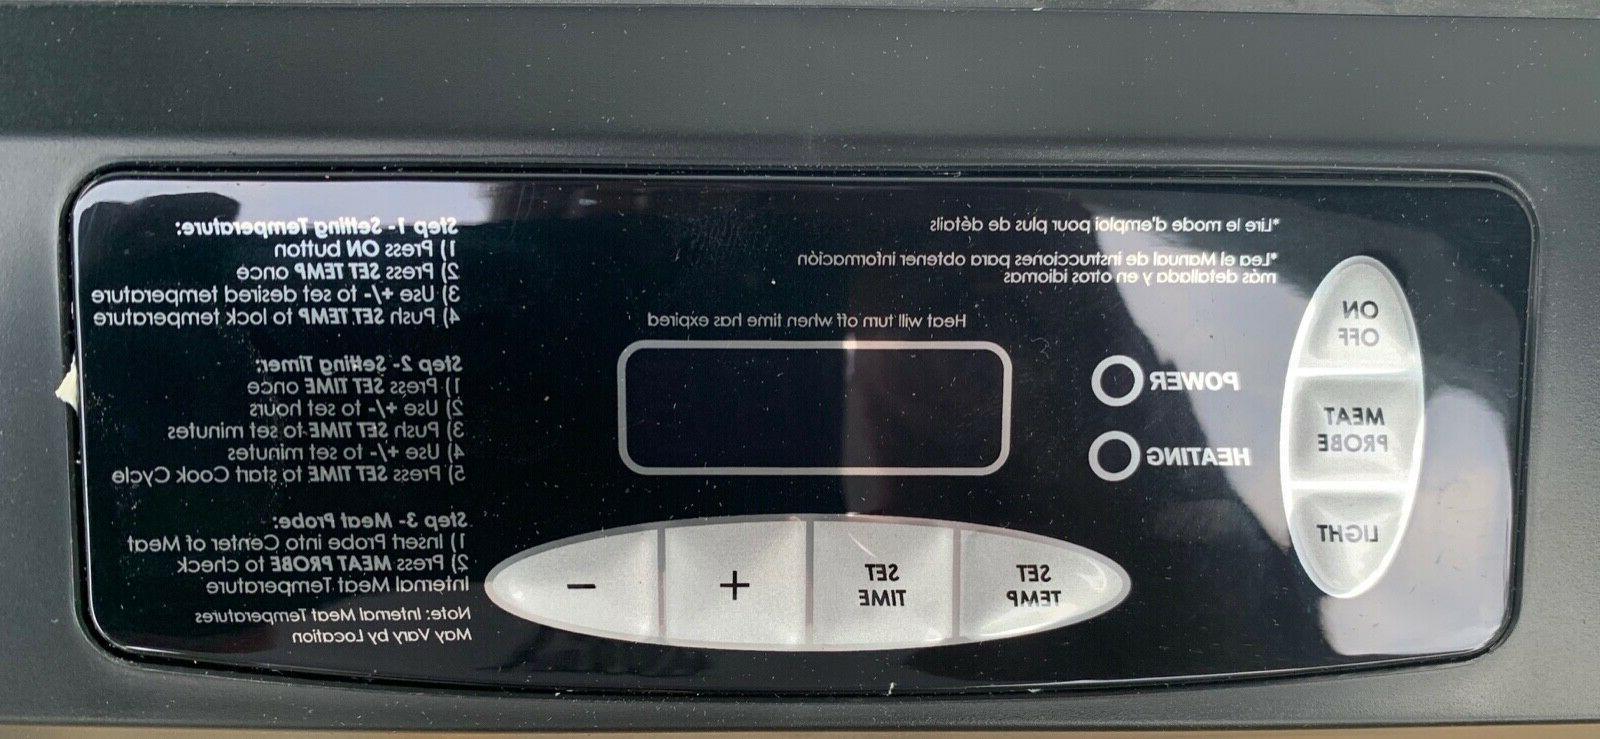 digital smoker control pn 9007140013